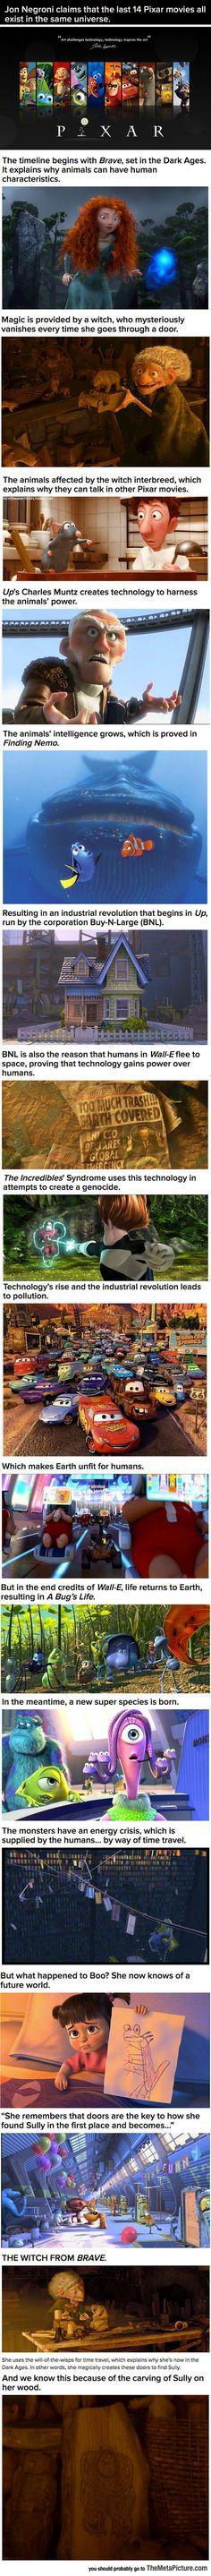 Mind-Blowing Pixar Theory